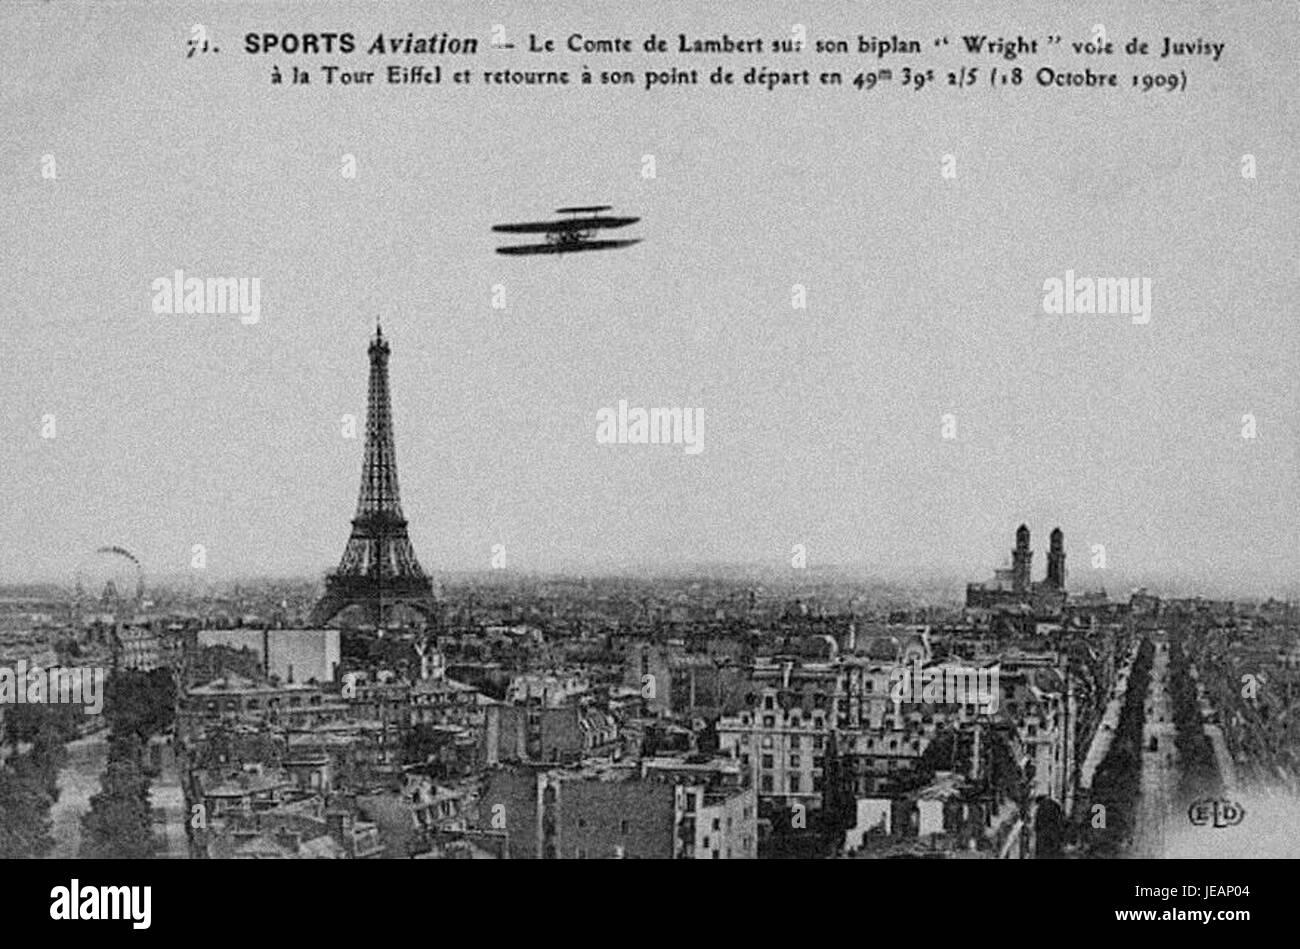 Carlos Alexandre, Conde de Lambert Sobrevoando ein Torre Eiffel keine Biplano Wrigth, 18 de Outubro de 1909 Stockfoto